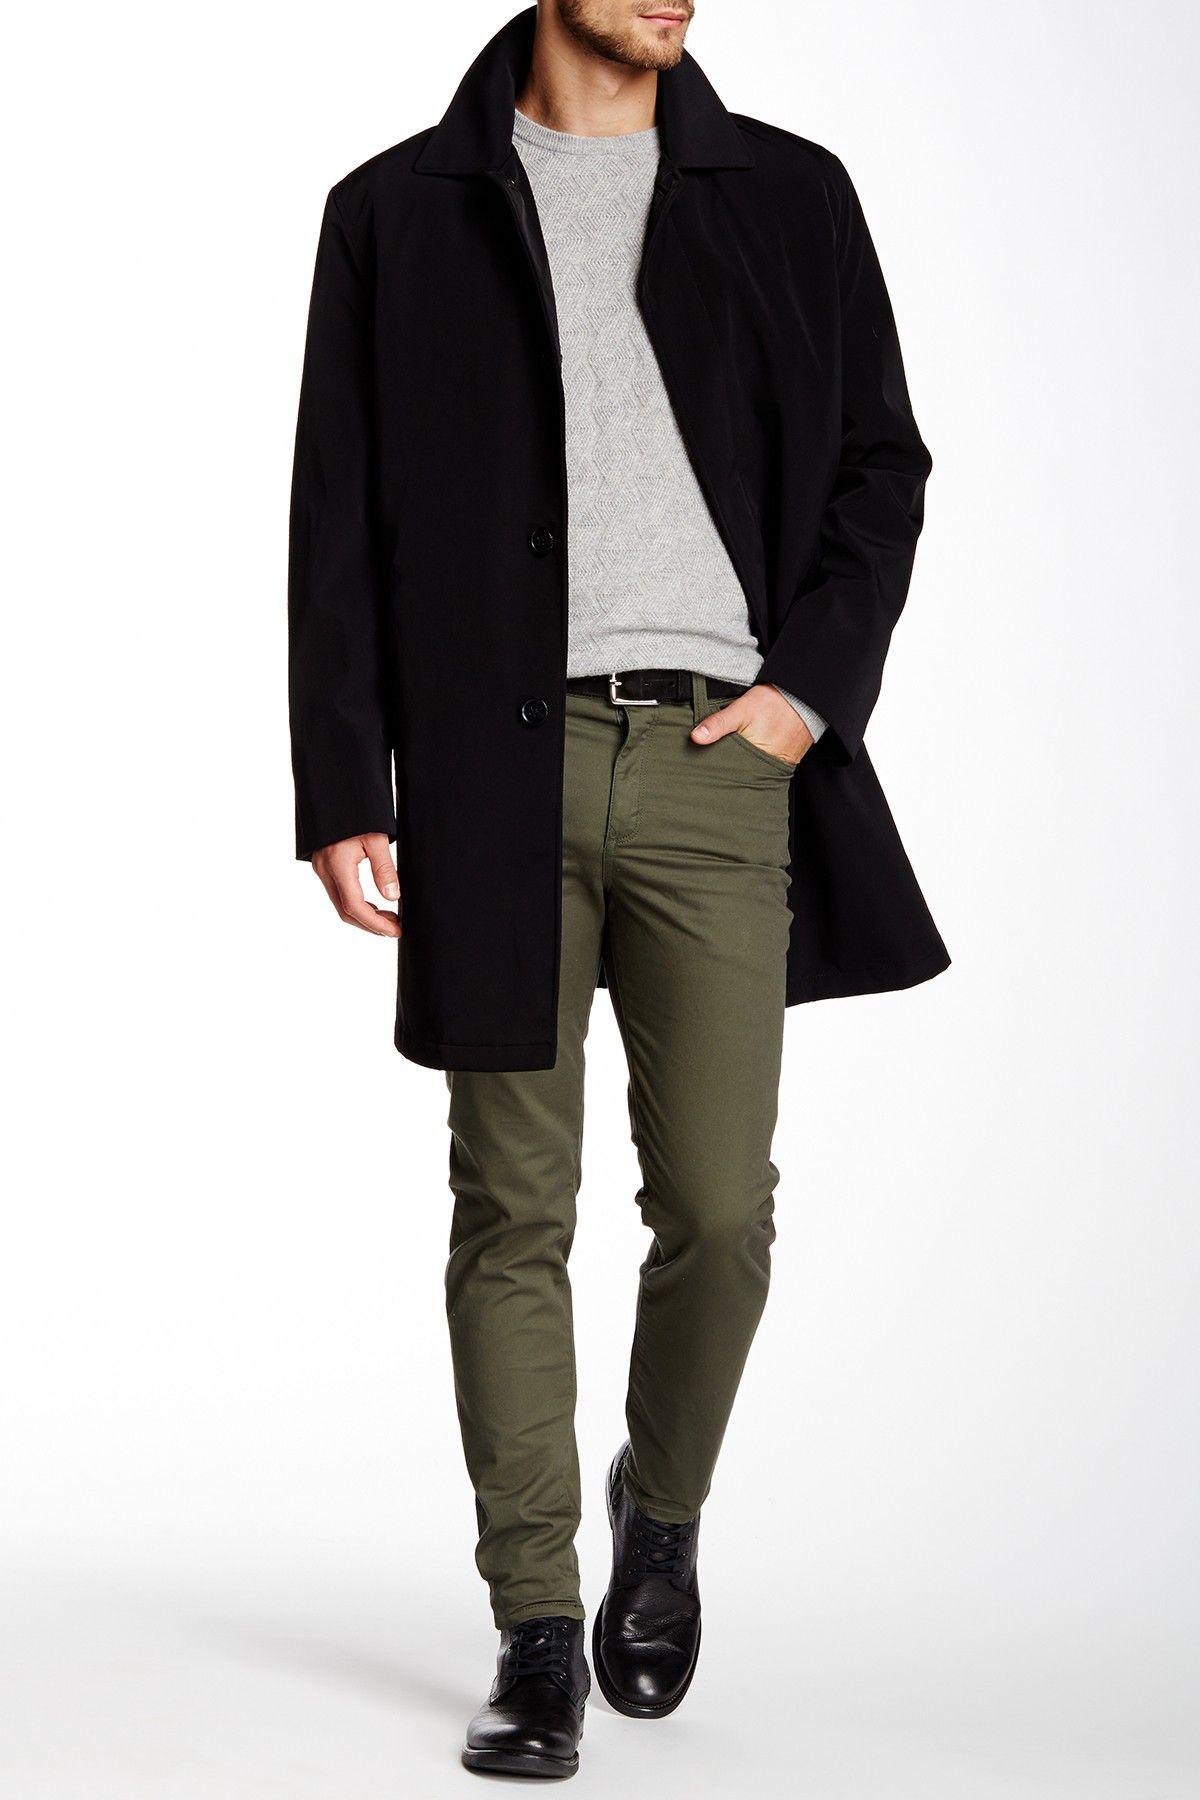 Ike Behar Jake Coat Nordstrom jackets, Mens style